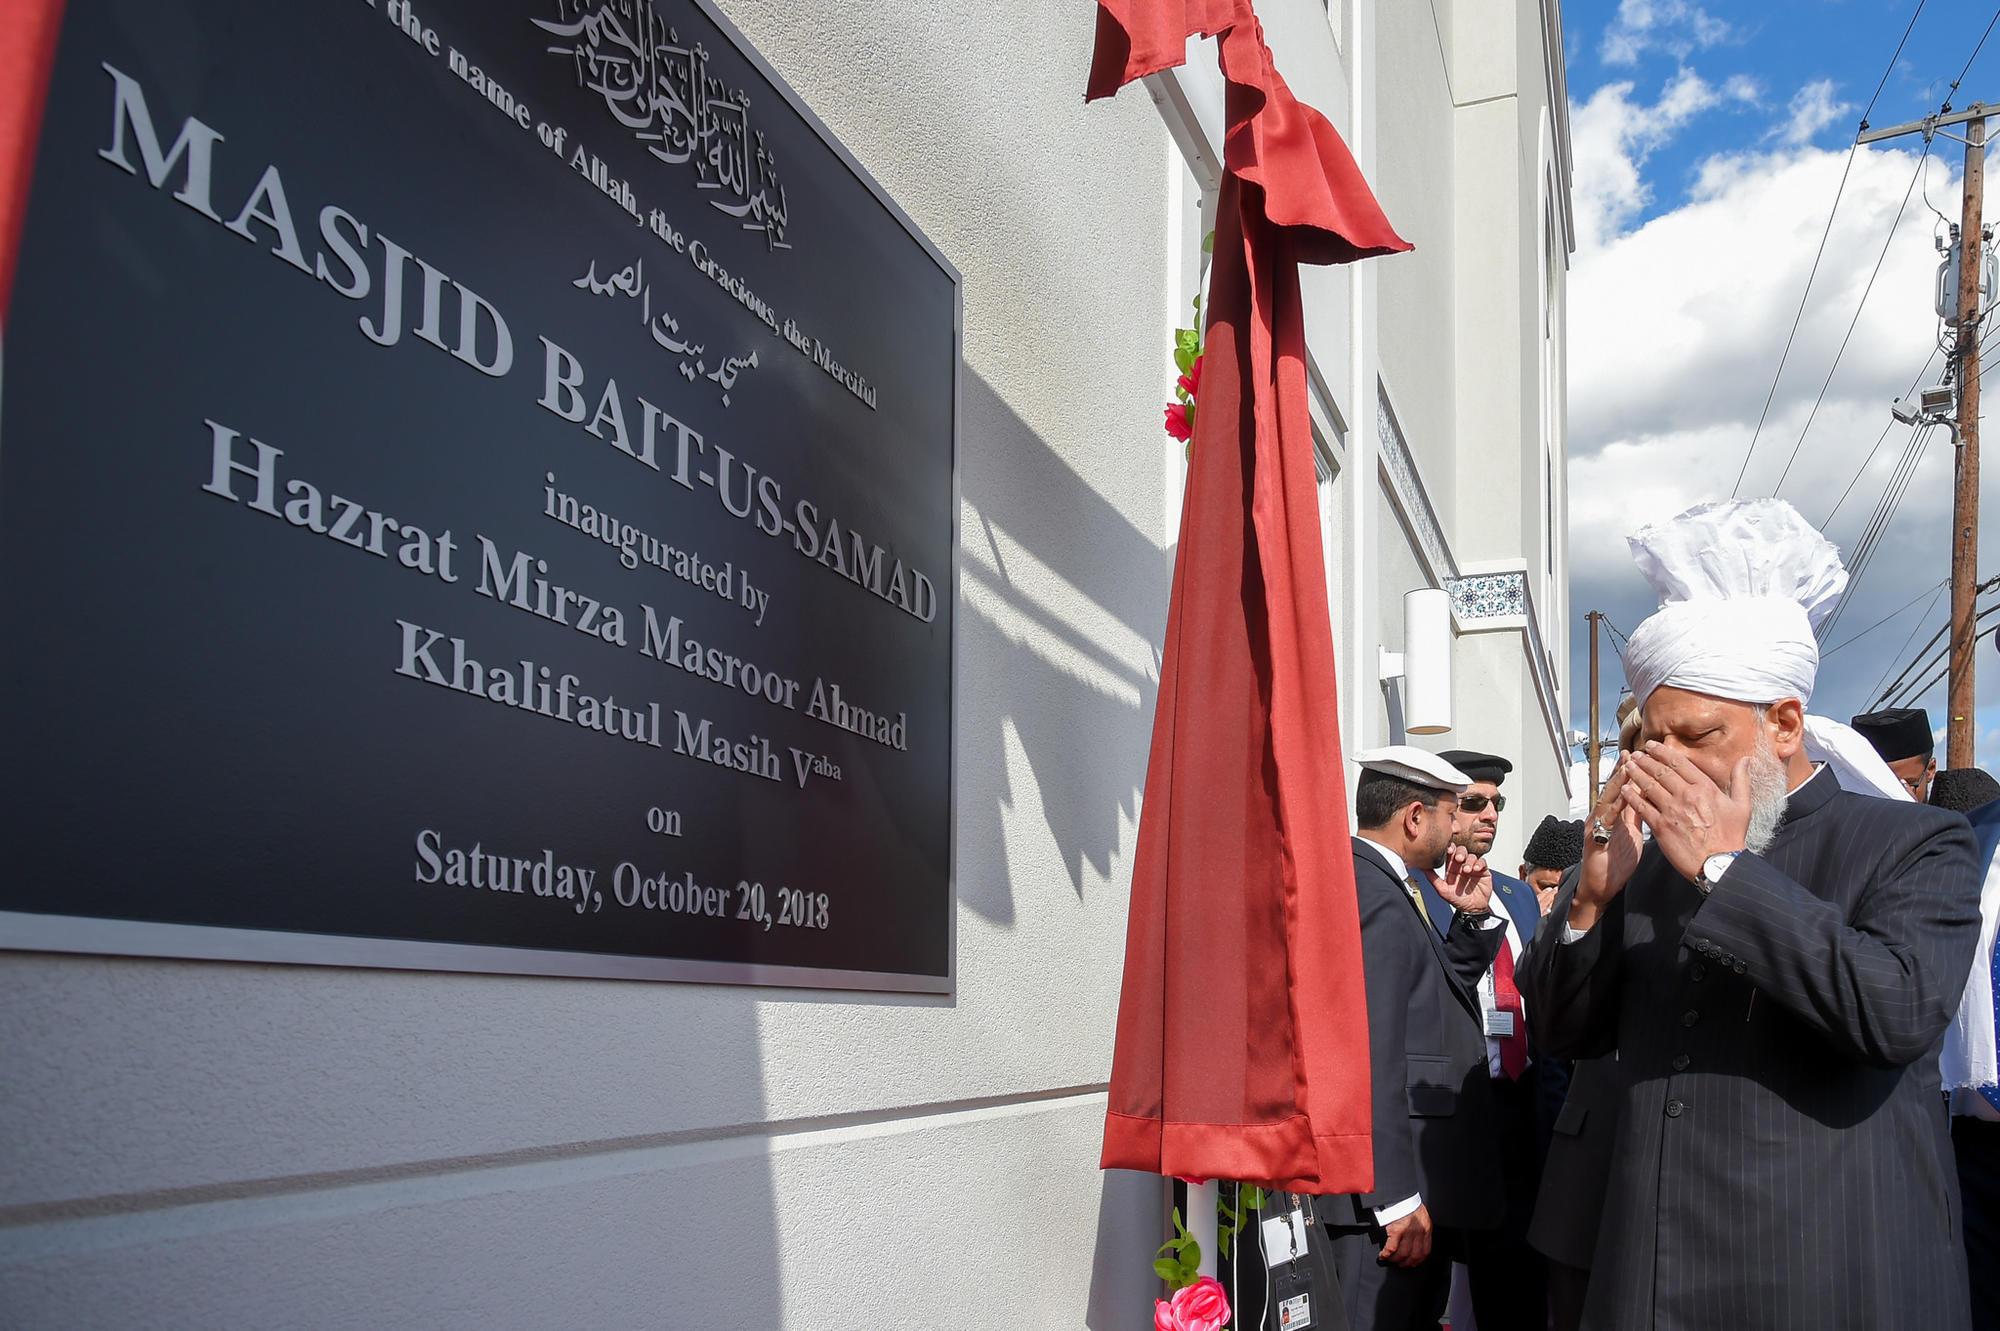 Ahmadi Muslims welcome their spiritual leader to Baltimore County mosque | Baltimore Sun